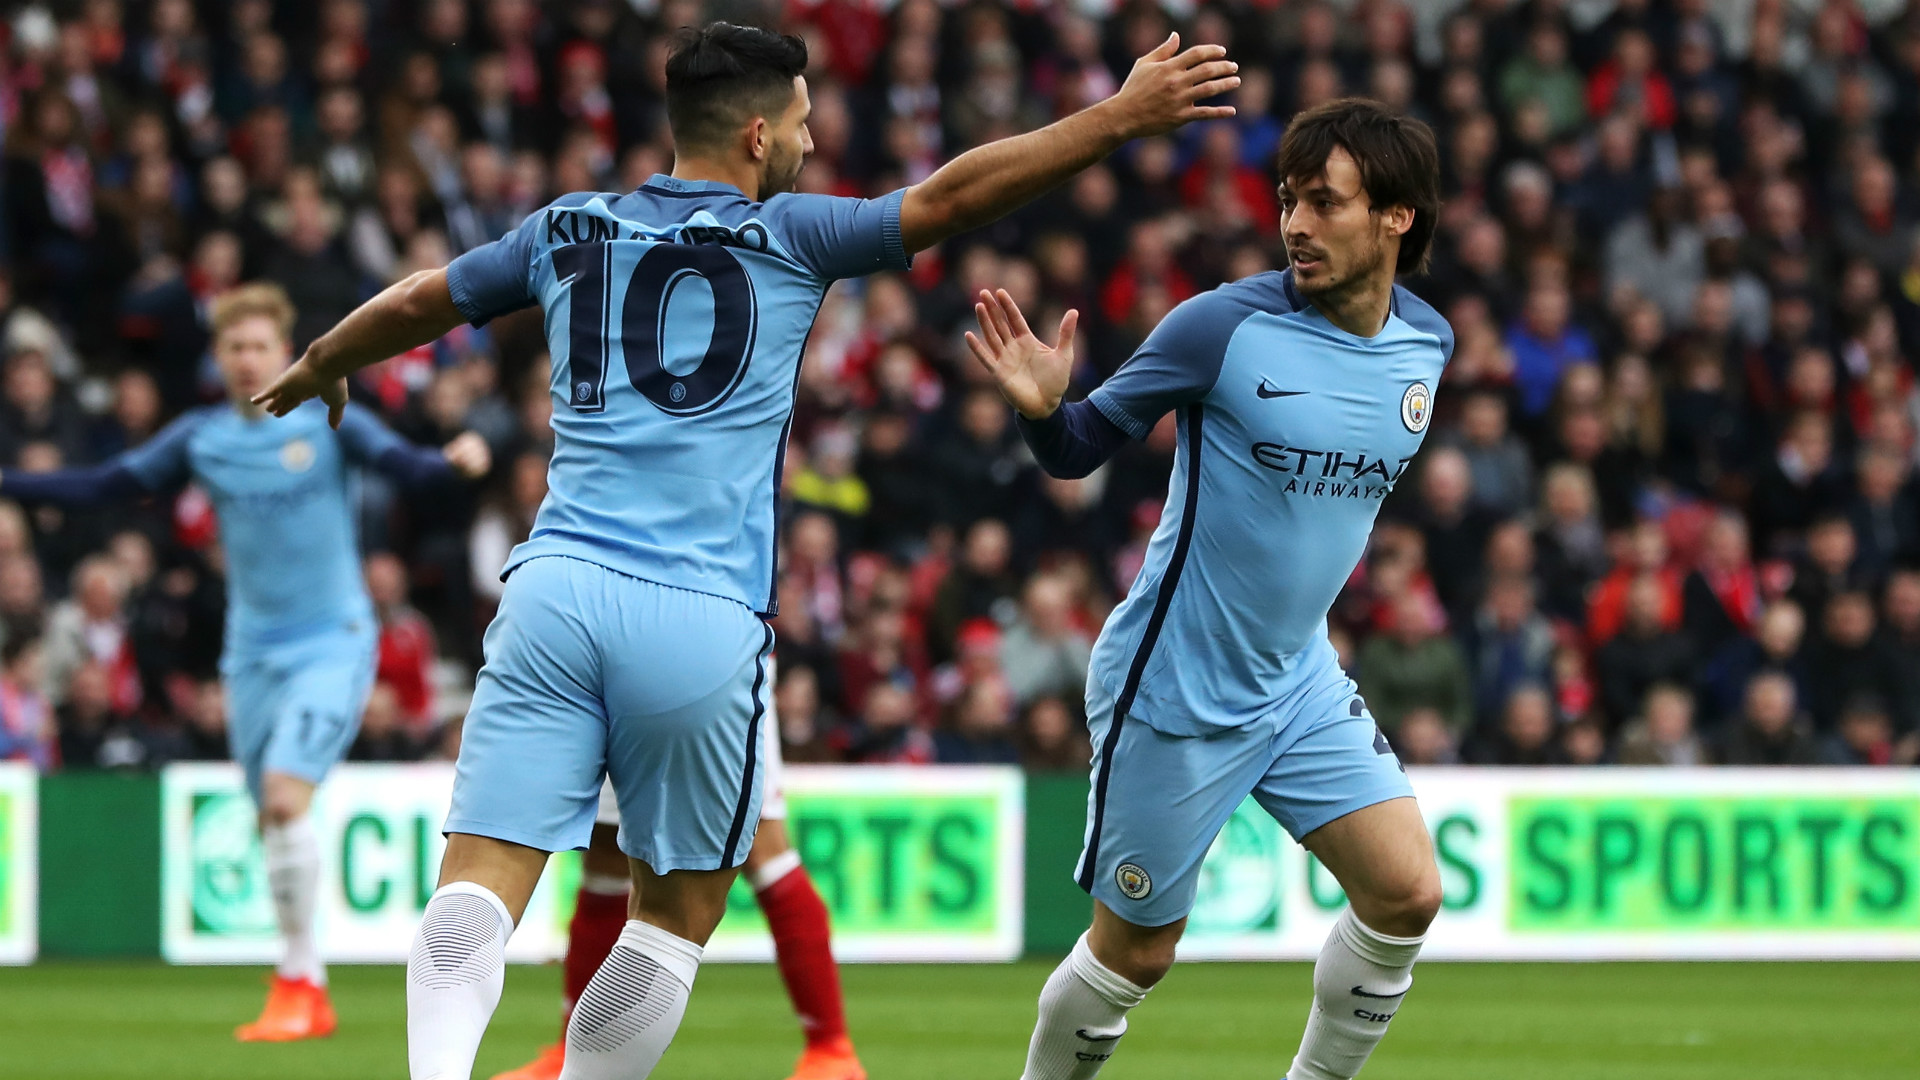 Manchester City im FA-Cup-Halbfinale